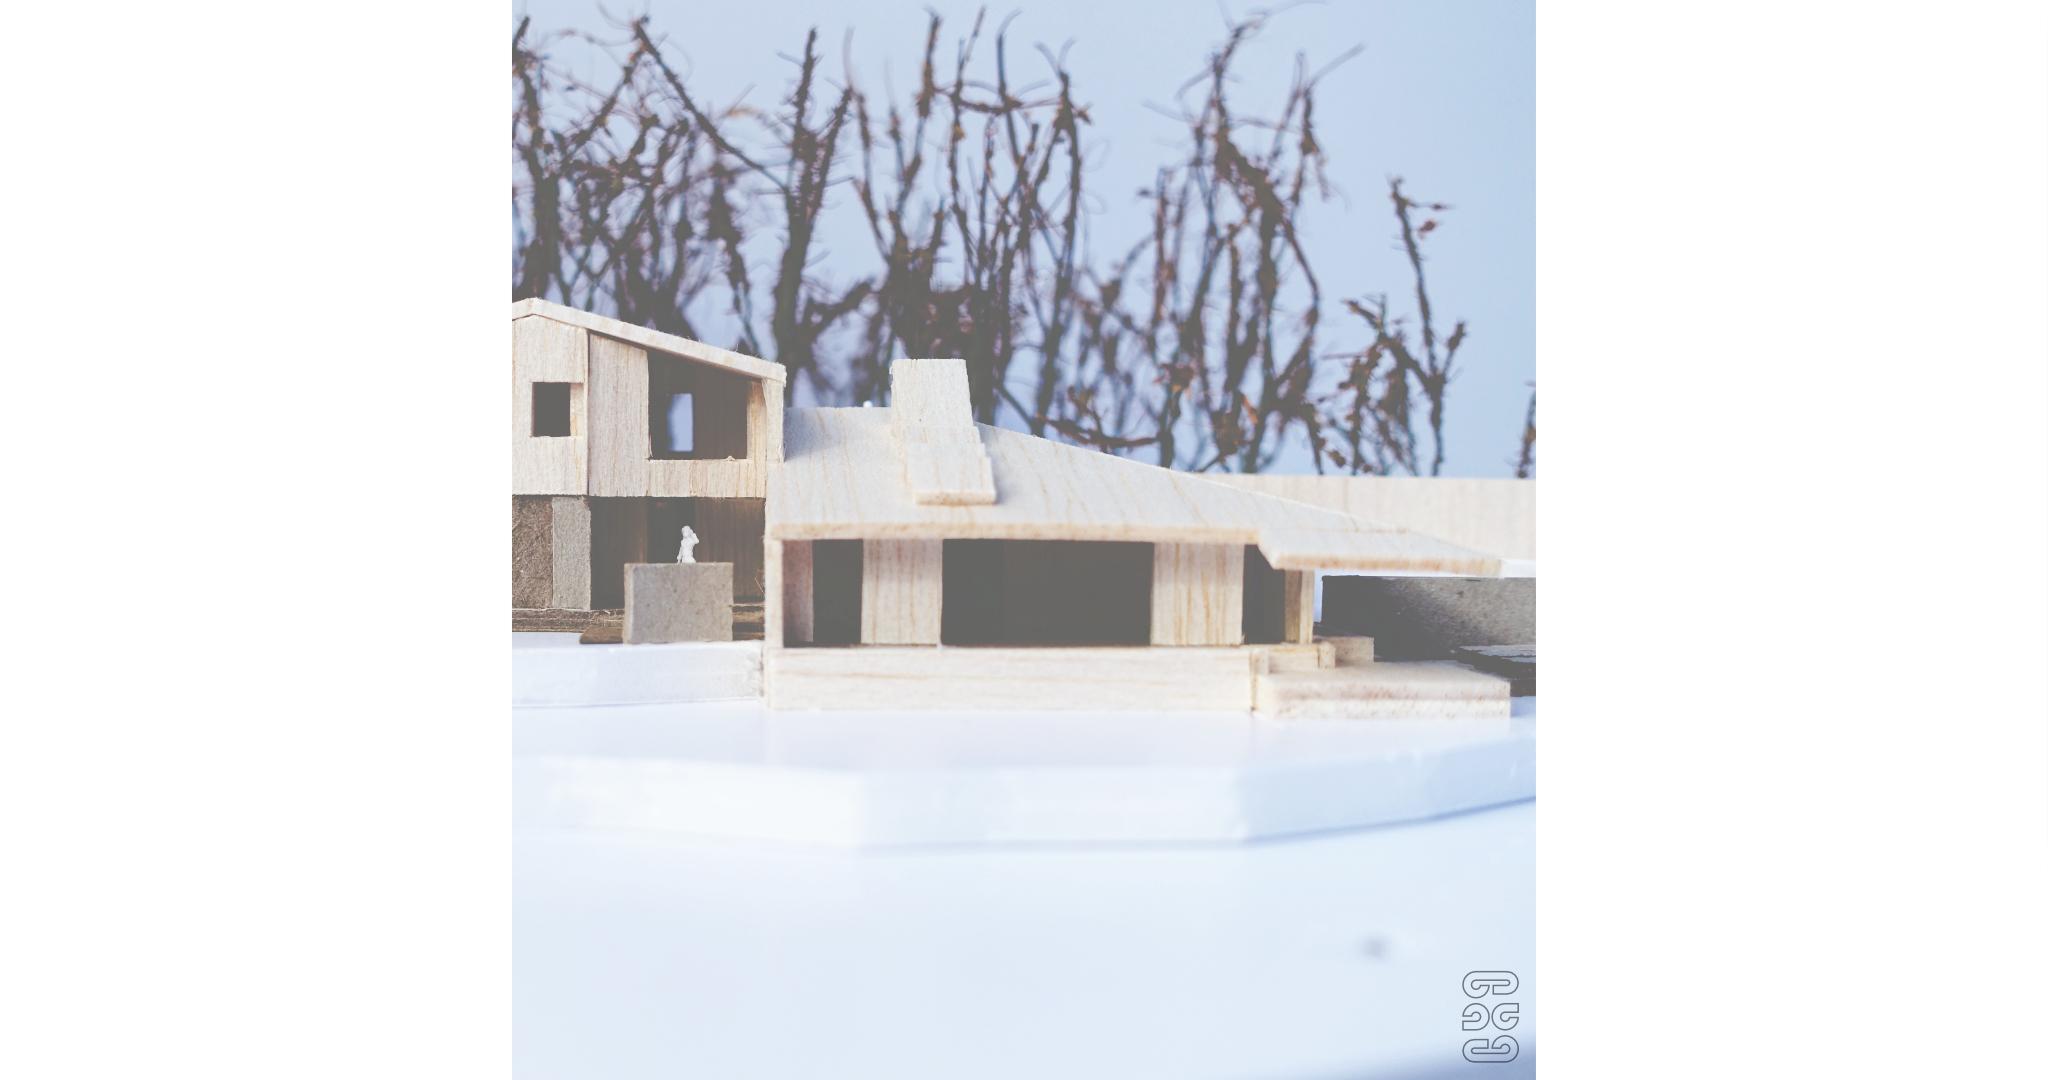 Taupo Passive House - Model Photo 04.jpg